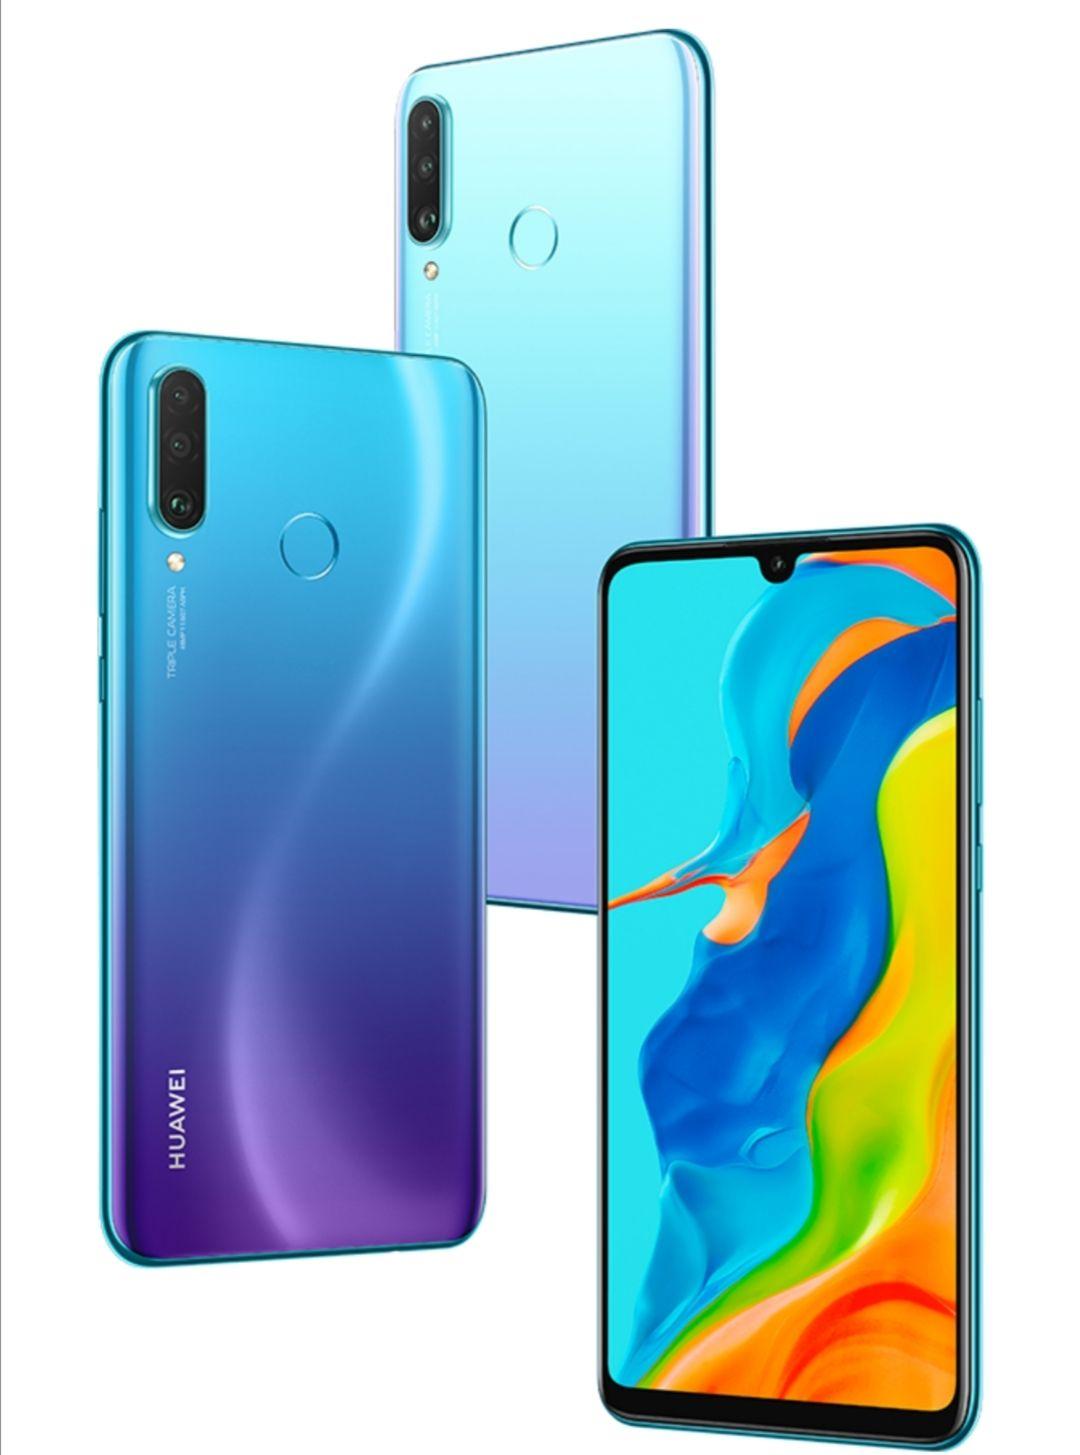 HUAWEI P30 Lite 256 GB 6 GB RAM Peacock Blue Smartphone - £179.99 With Code + More @ Huawei Store UK